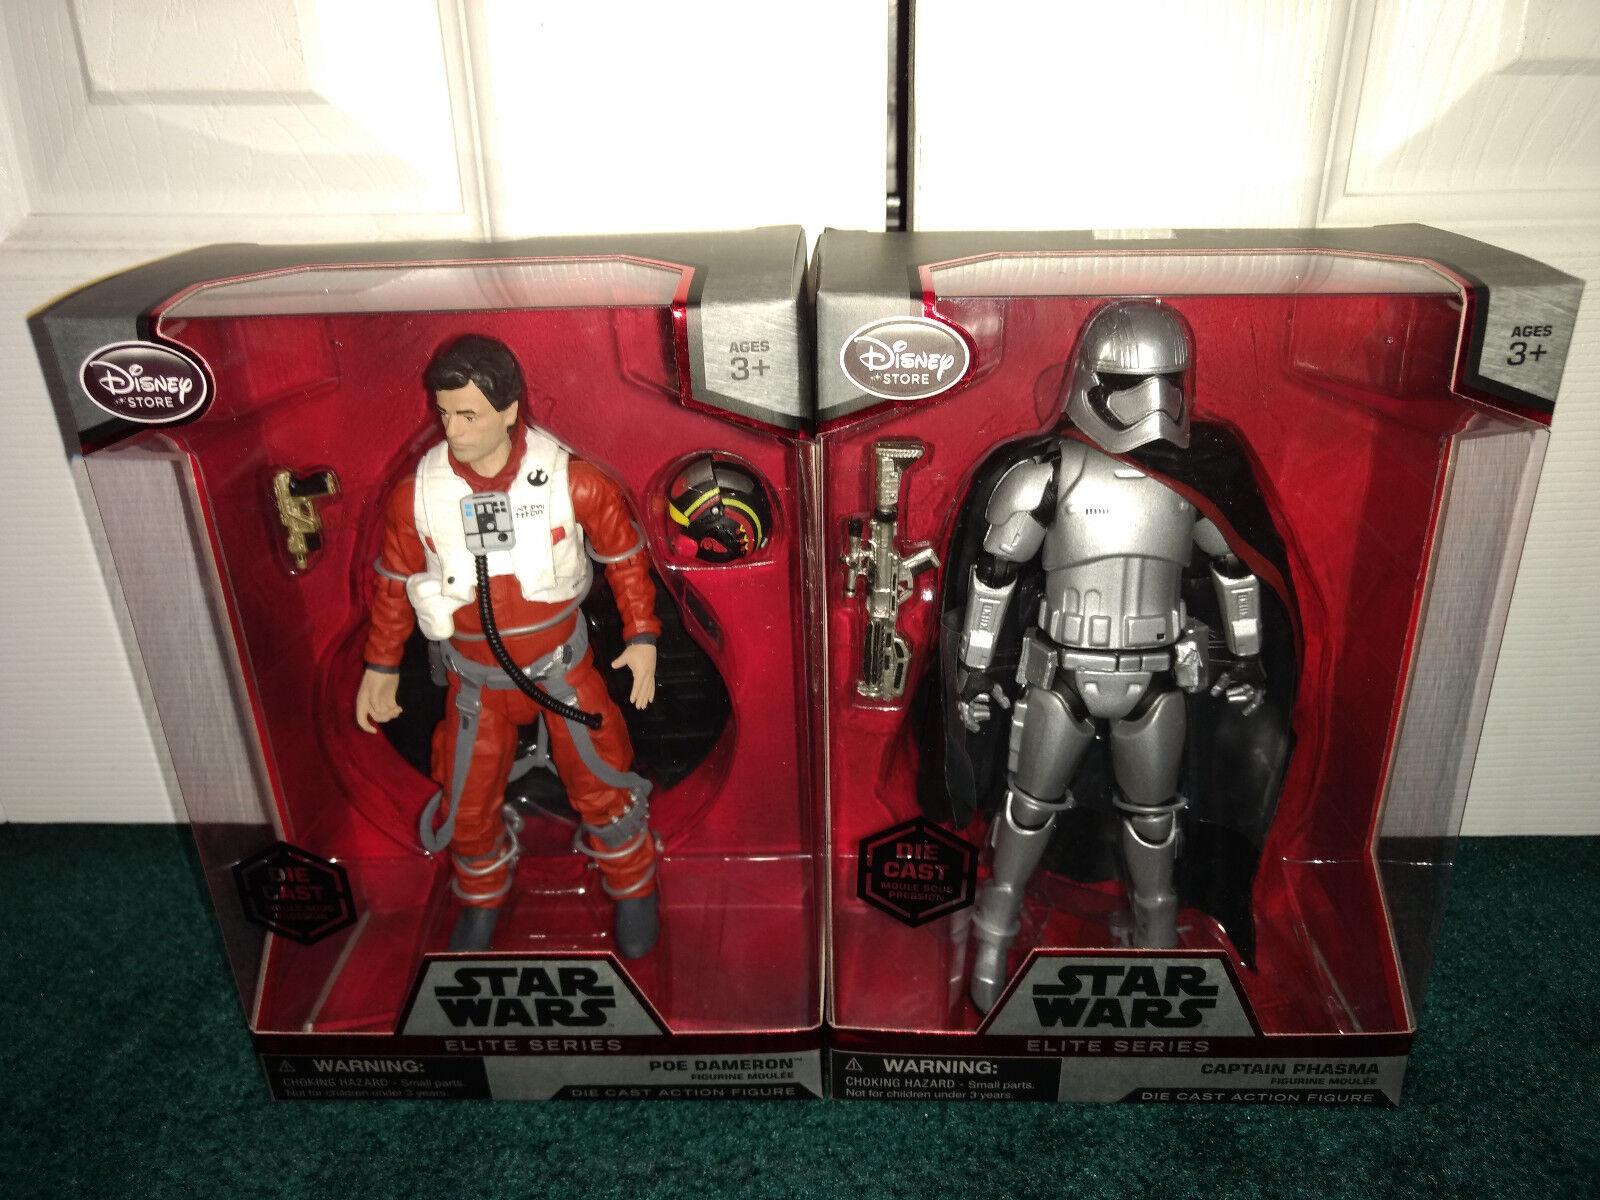 Estrella Guerras Elite Series The Force Awakens LOT Rey Rey Rey BB-8 Finn Poe Dameron Kylo Ren 005997